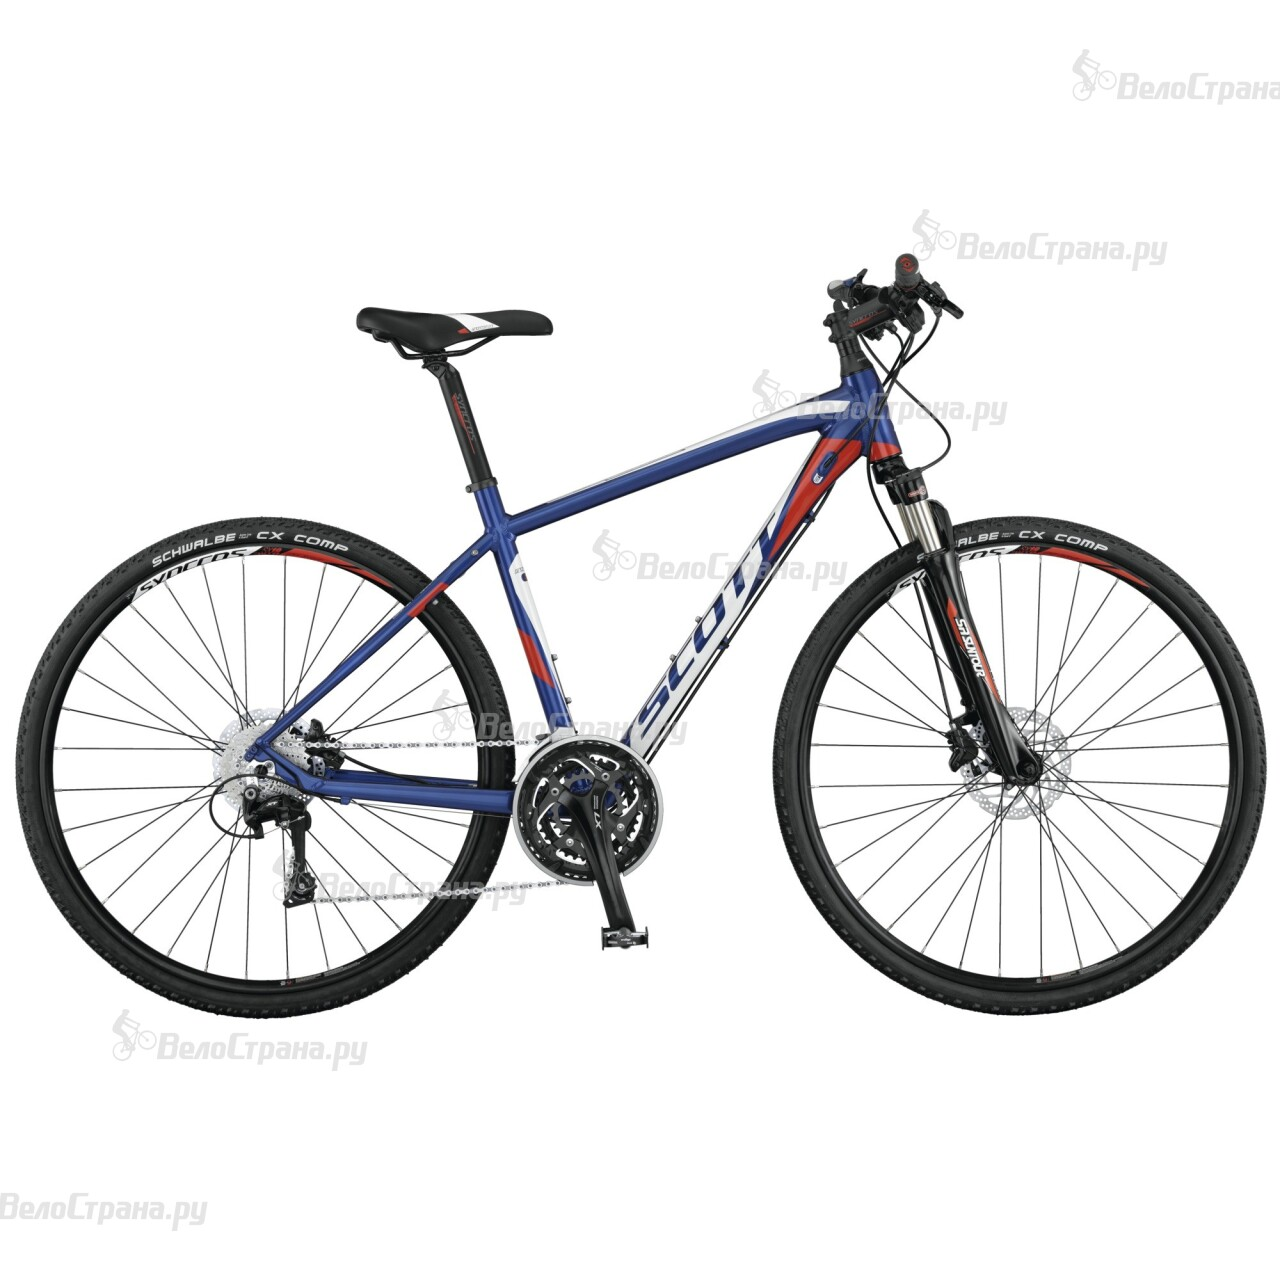 Велосипед Scott Sportster 10 (2015) motorcycle chrome front spoiler chin fairing for harley sportster xl883 1200 04 15 new